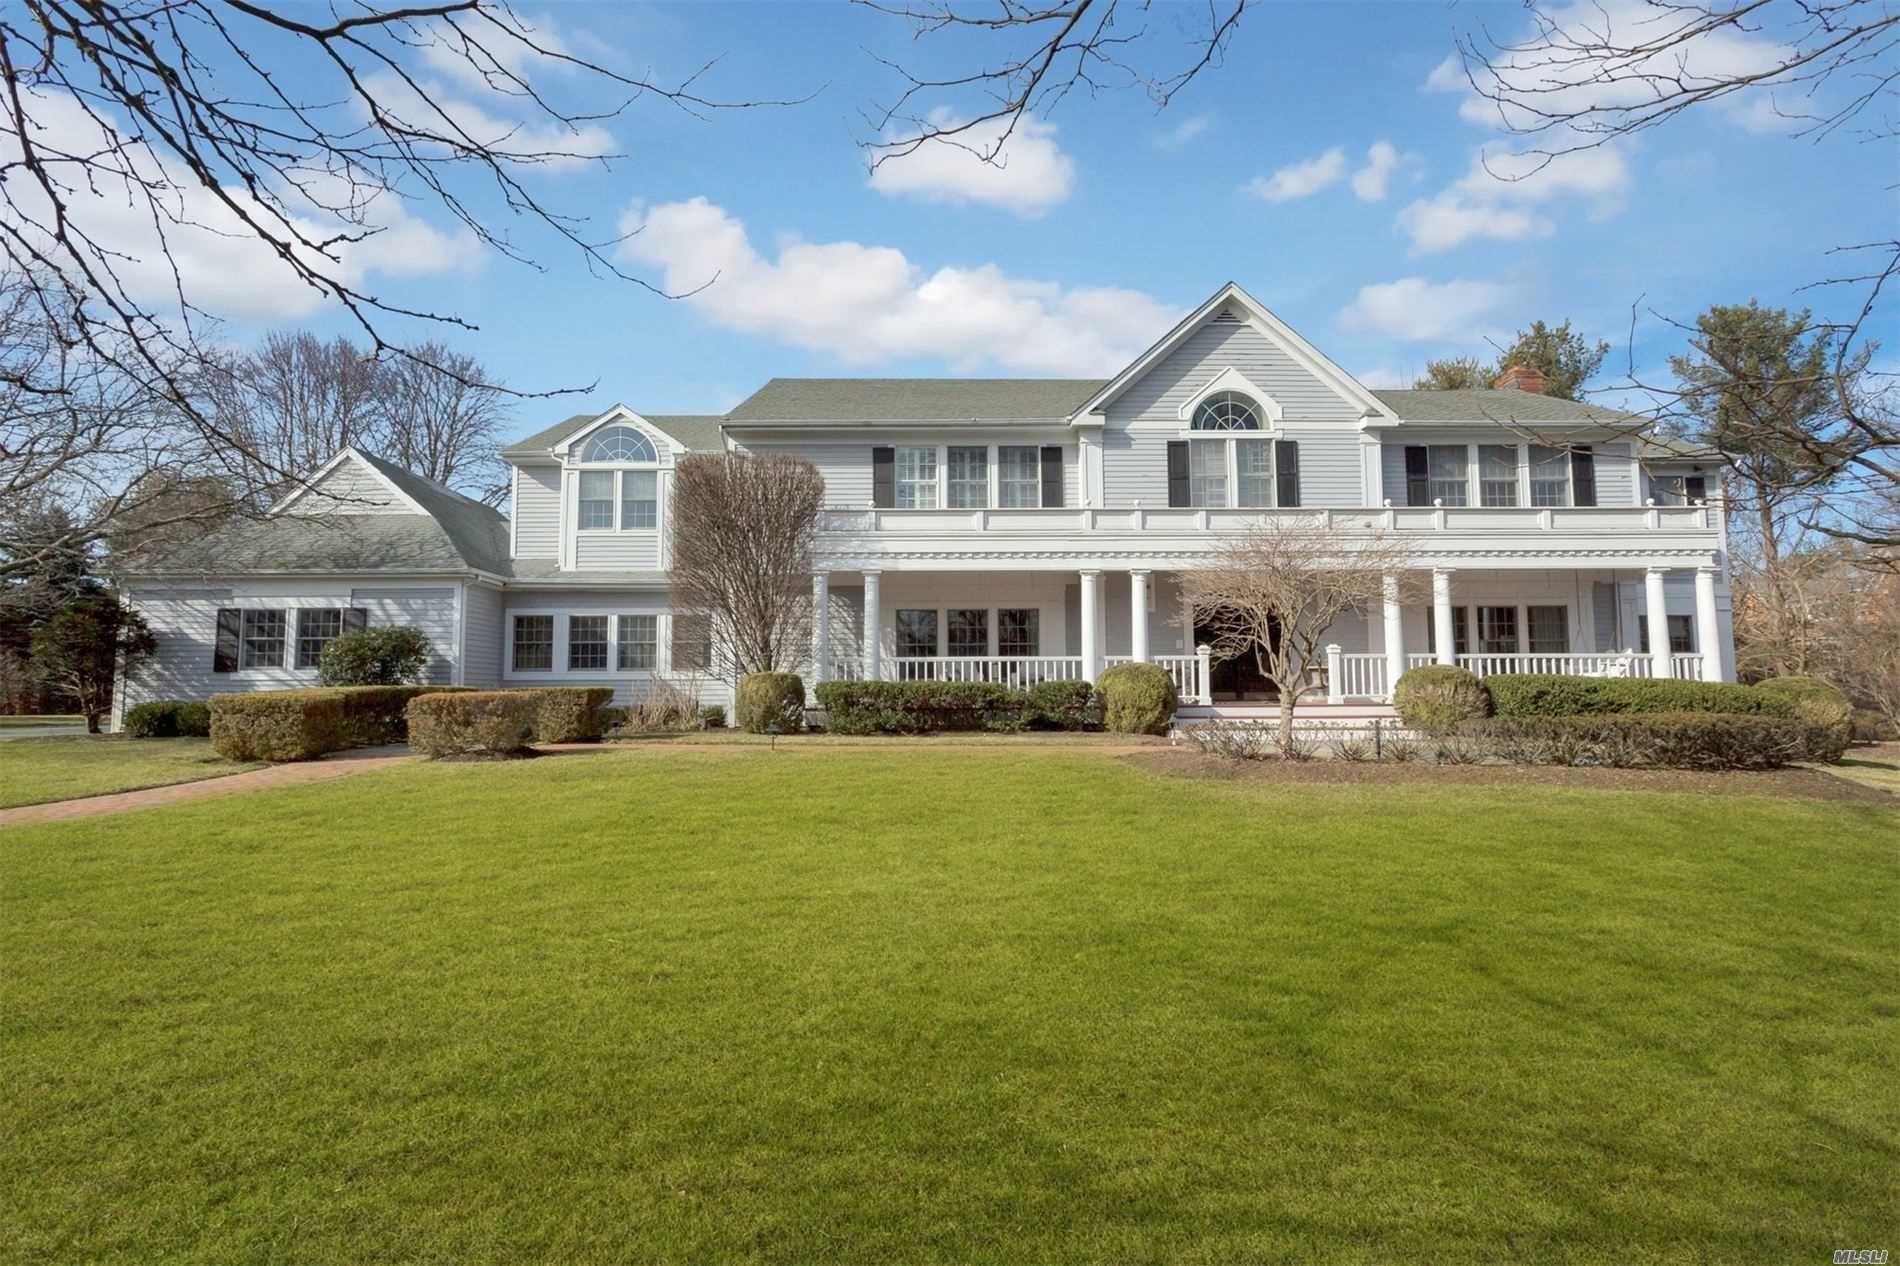 9 Fox Meadow Lane, Lloyd Harbor, NY 11743 - MLS#: 3206374